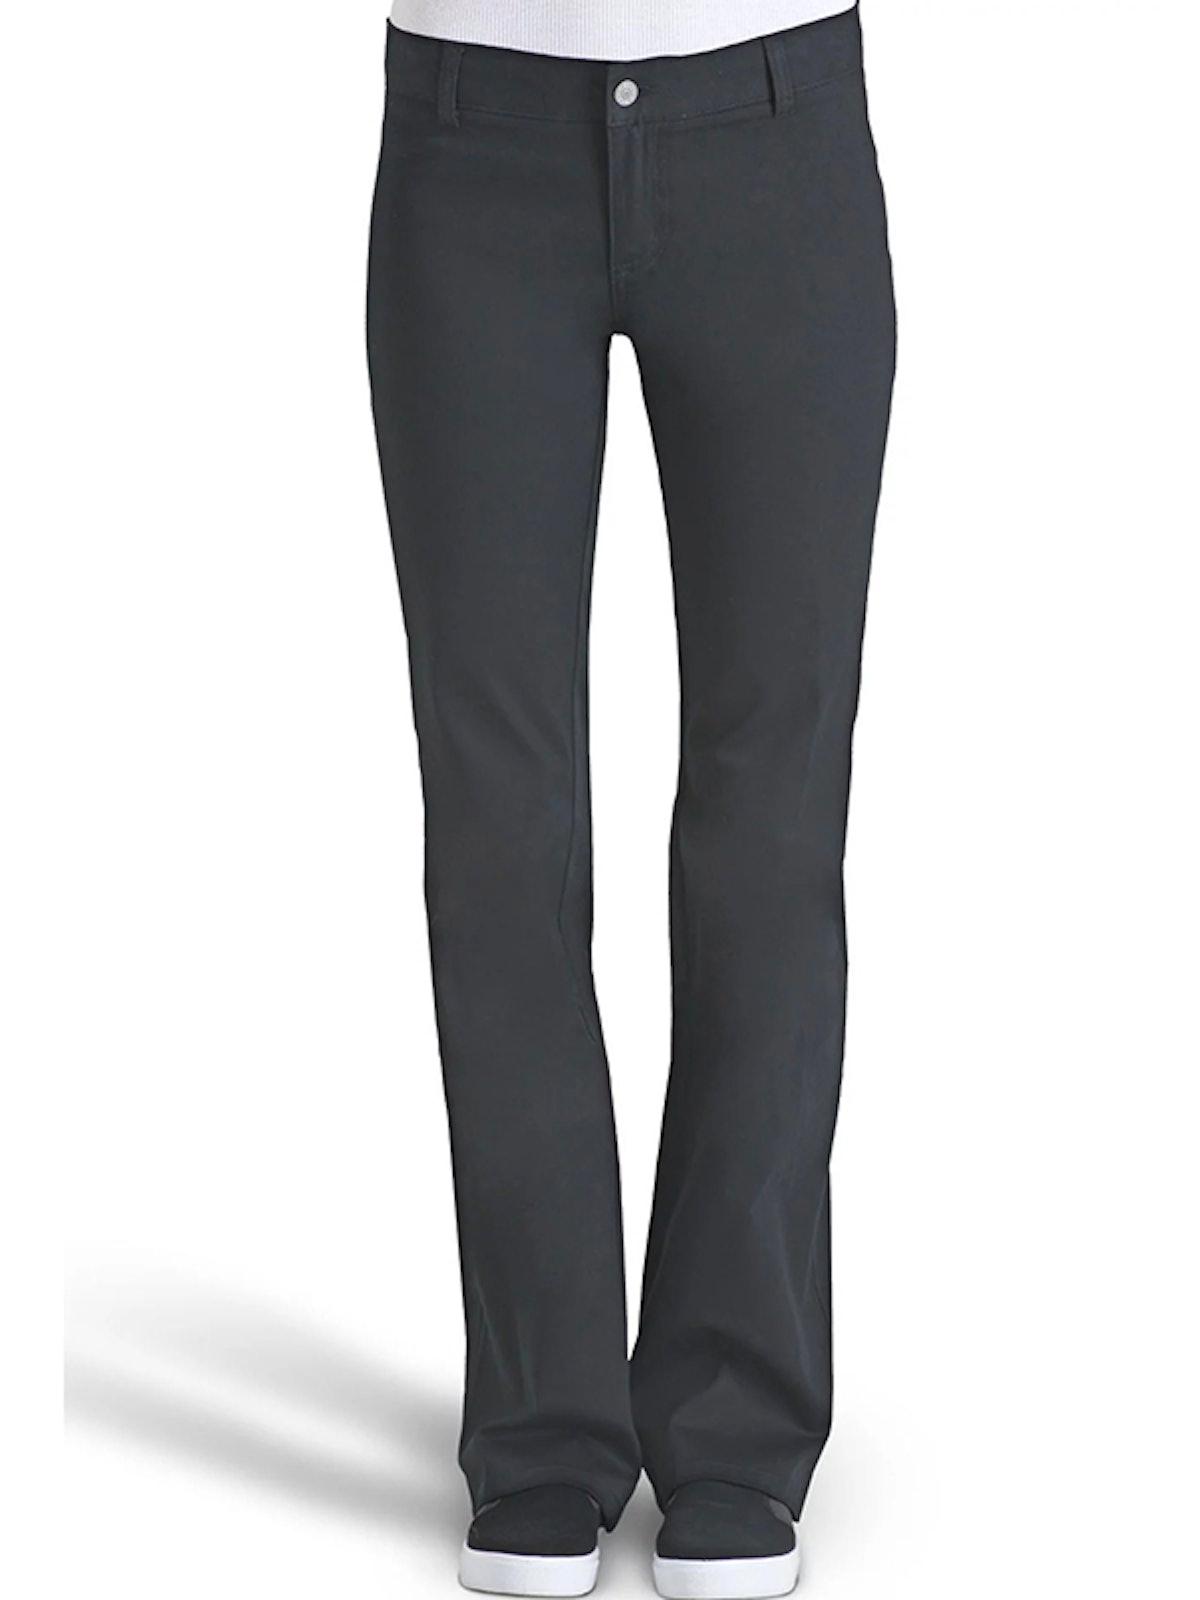 Slim Fit Bootcut Leg Worker